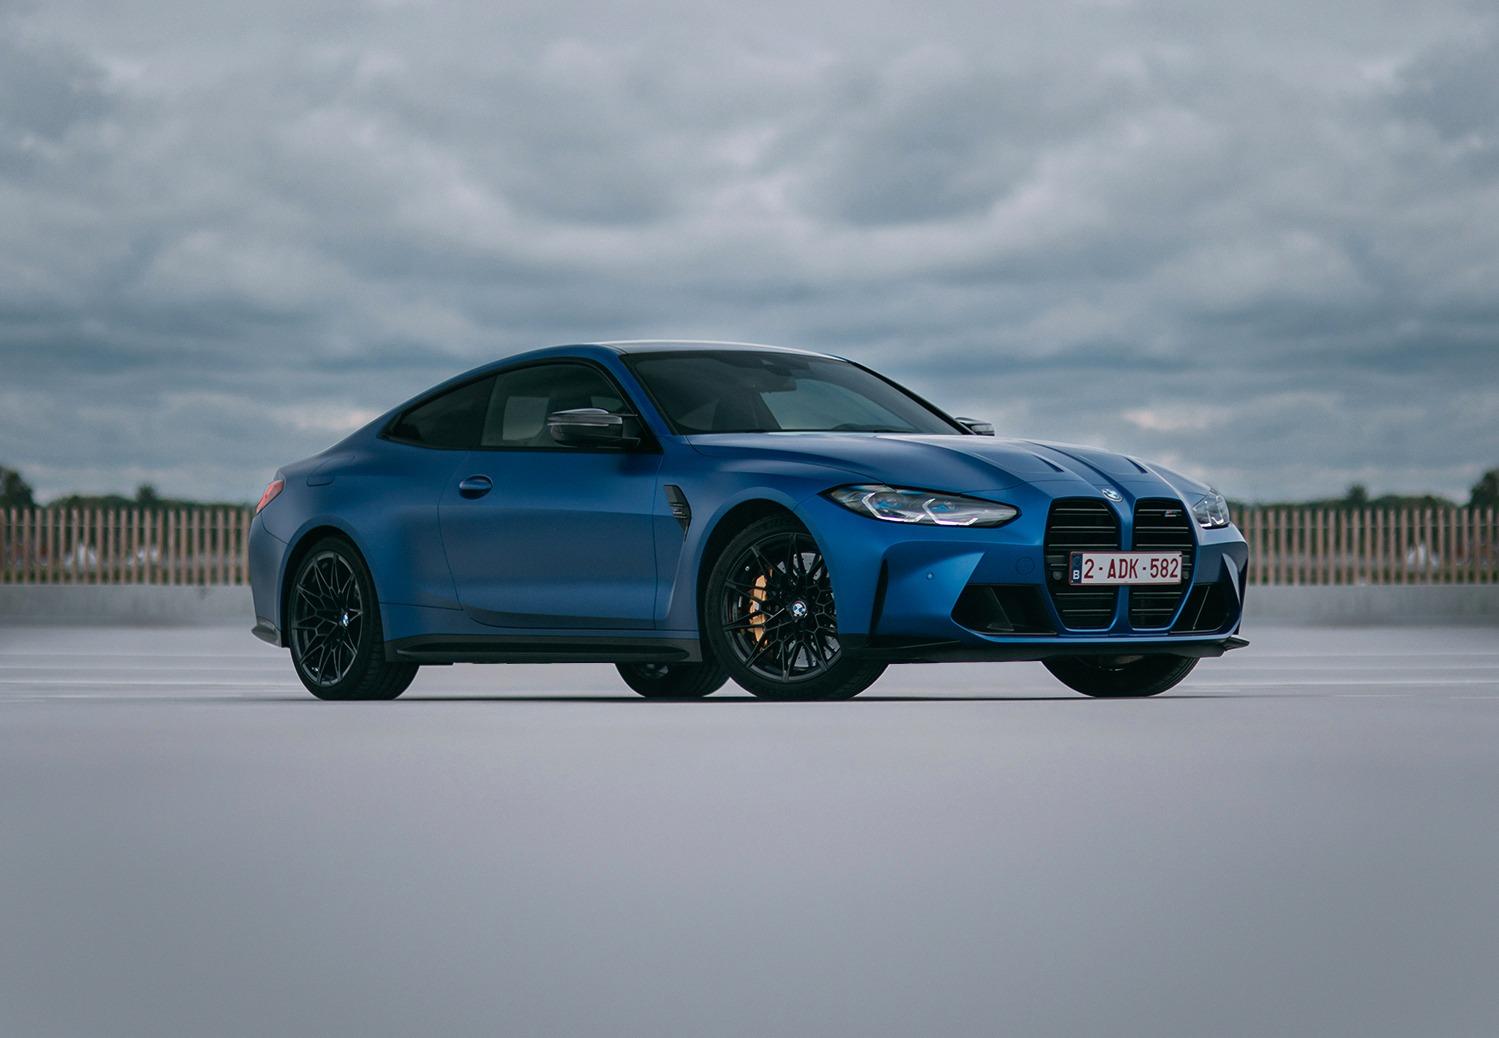 Rijtest: BMW M4 Competition